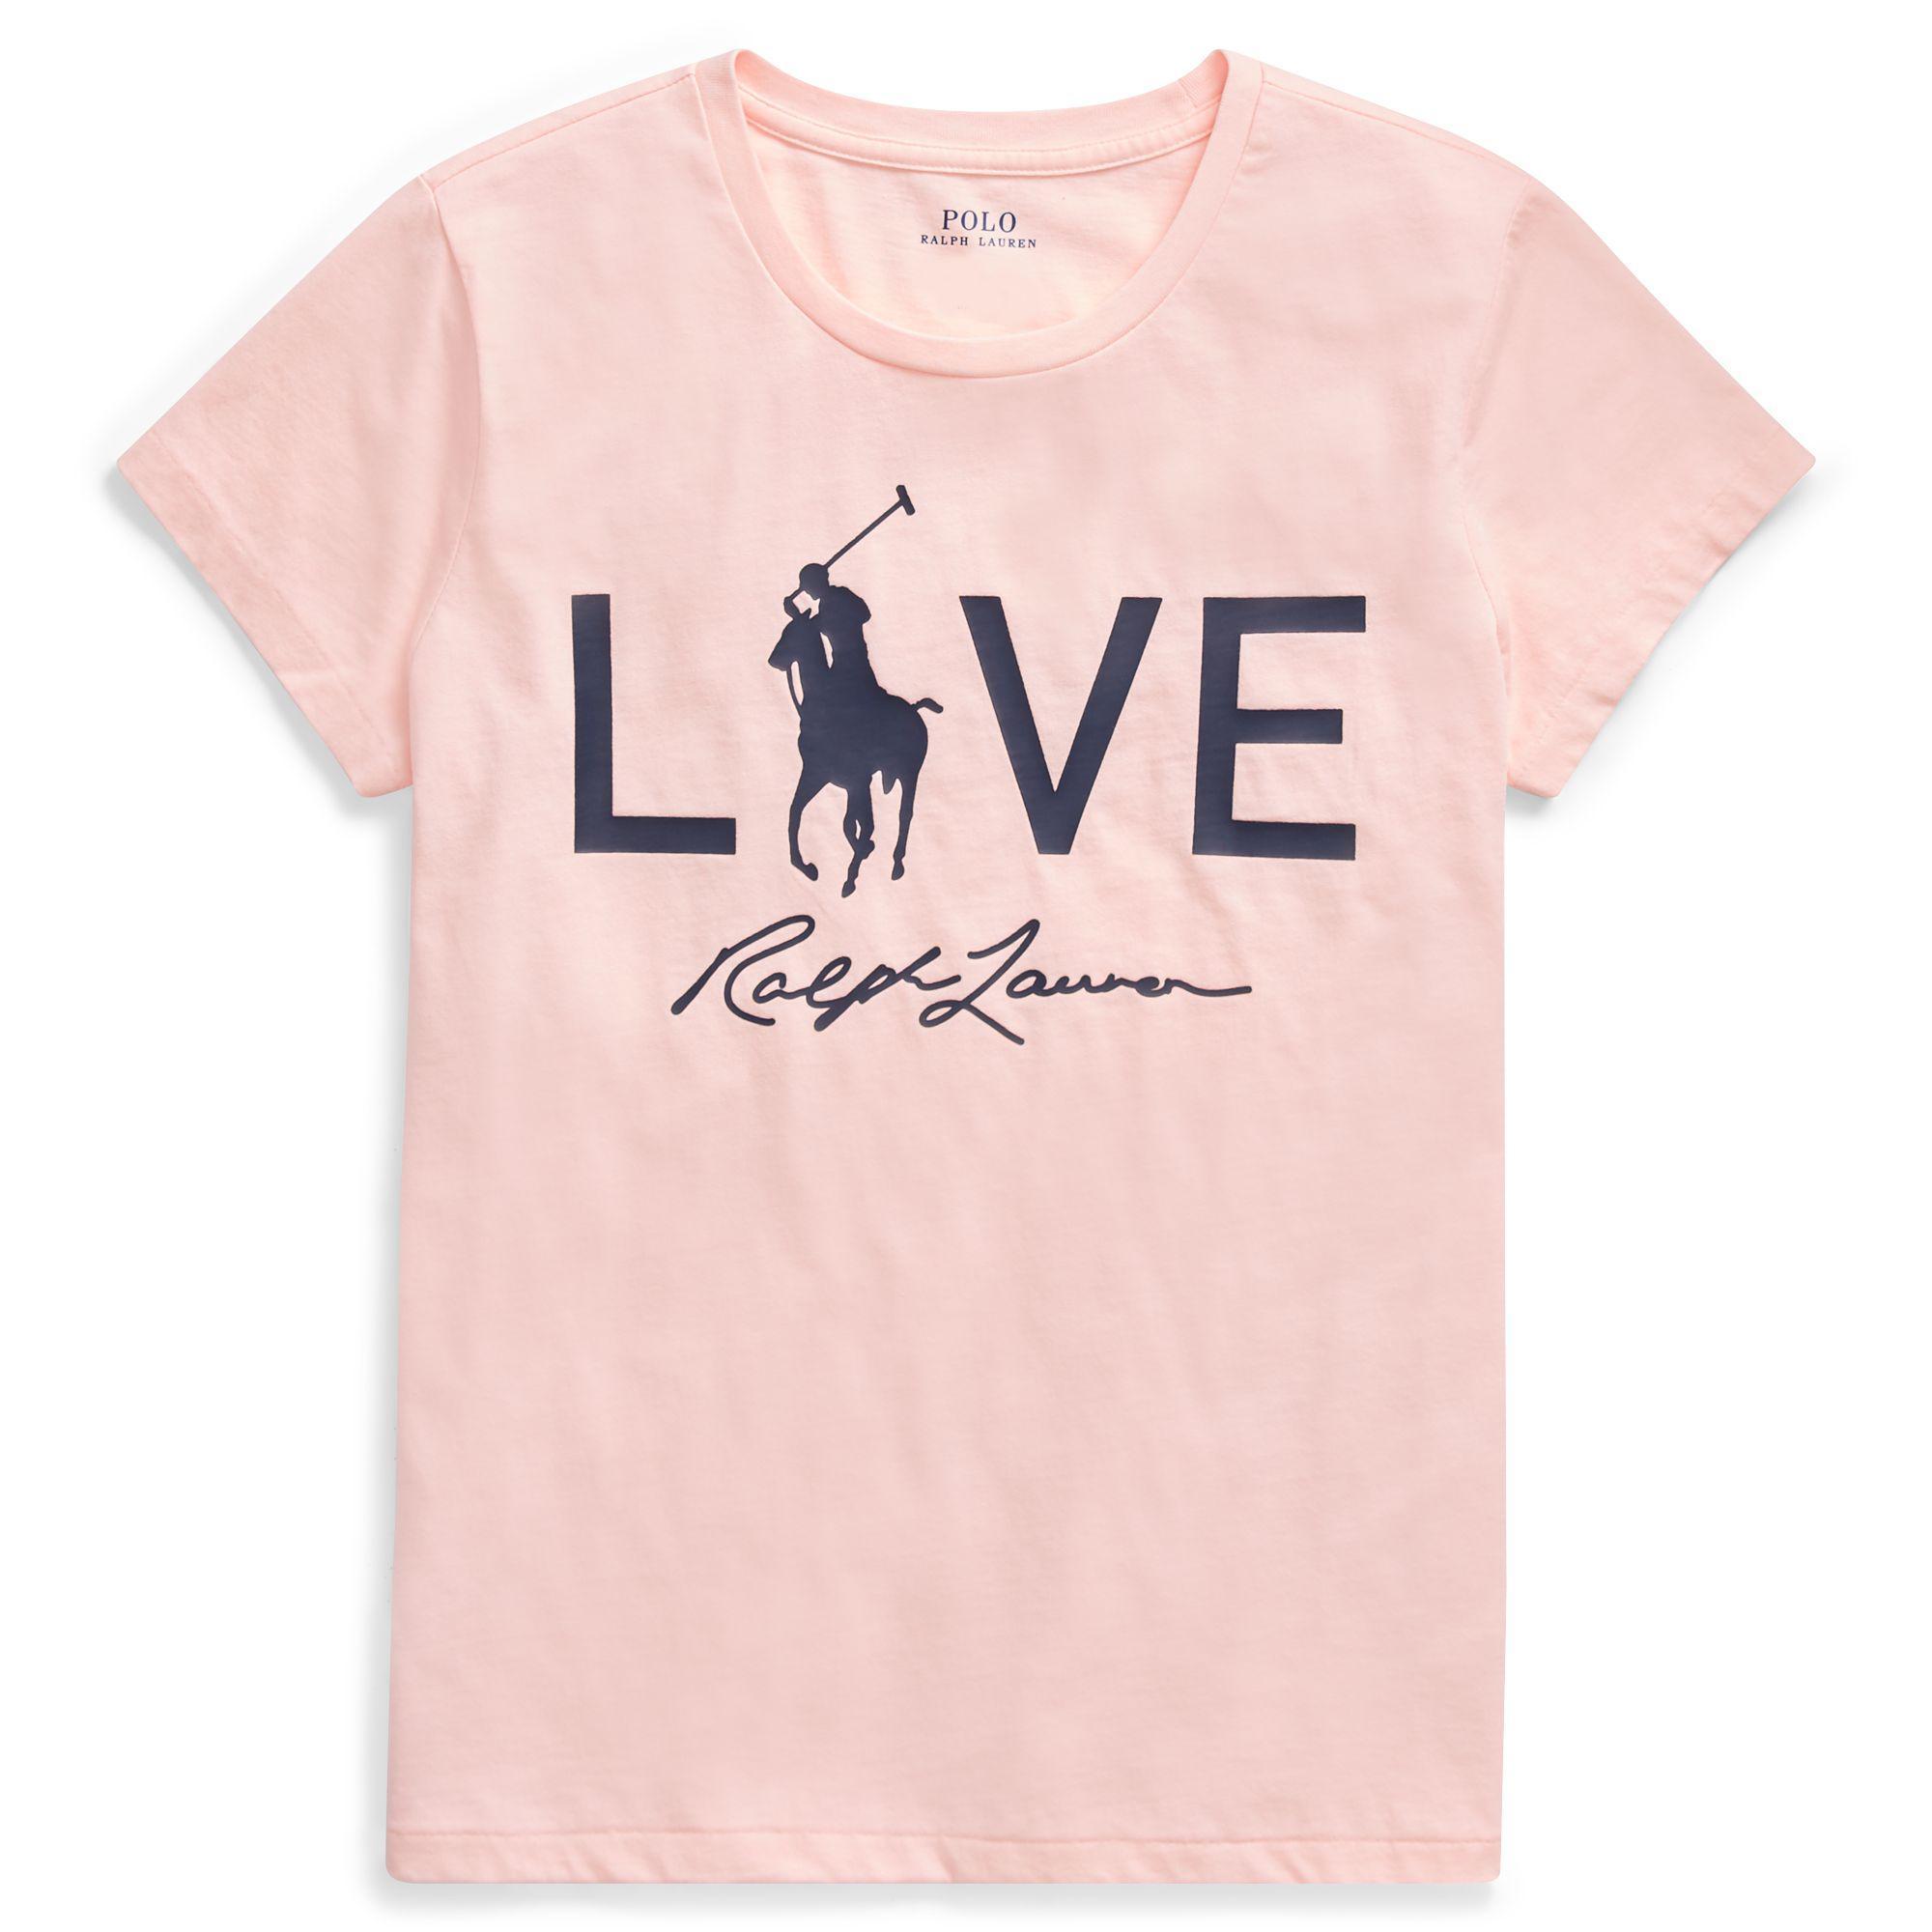 85981b21 Ralph Lauren Pink Pony Love Graphic T-shirt in Pink - Lyst